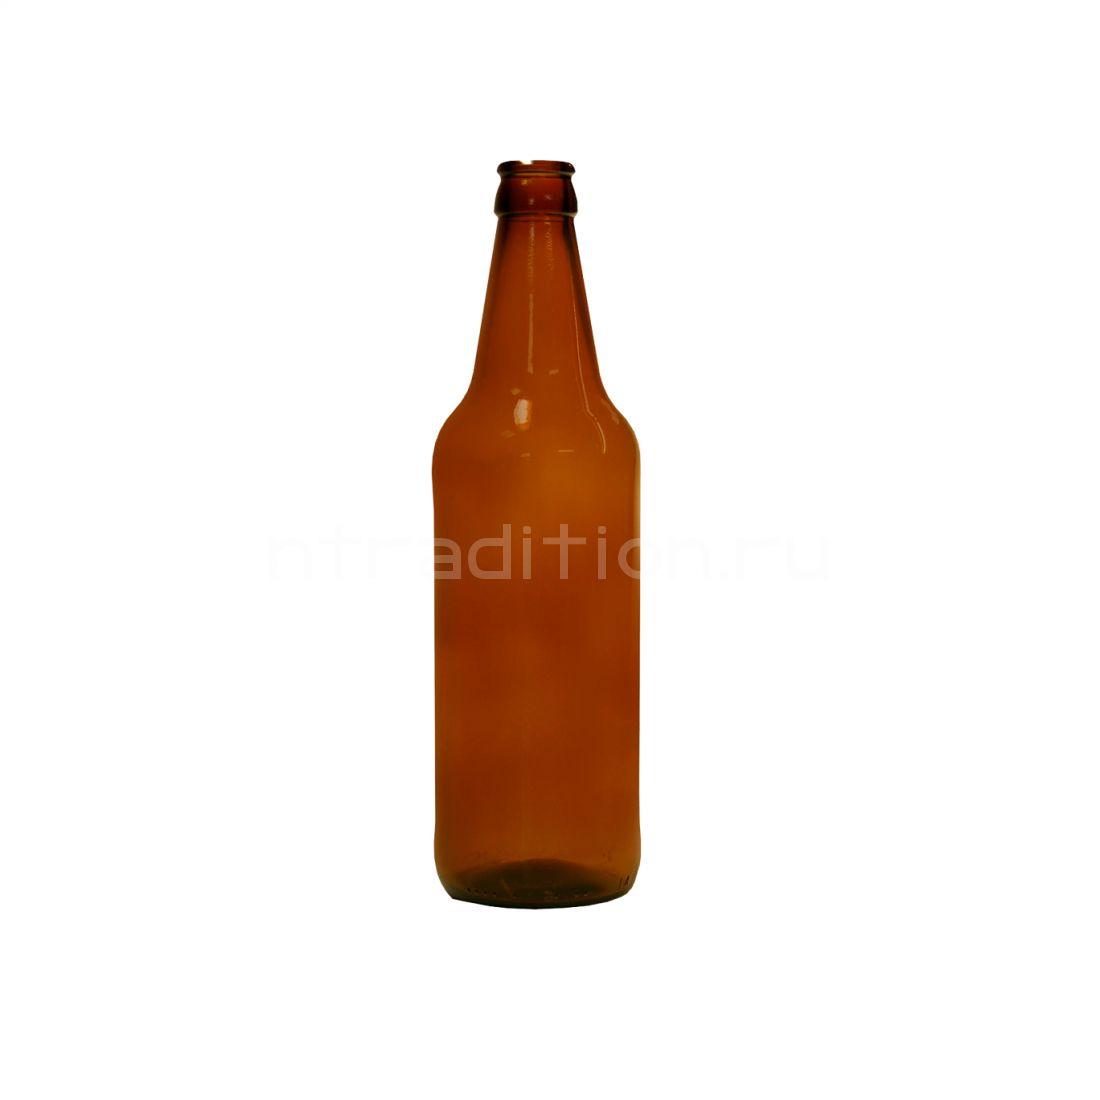 Бутылка под кронен-пробку Варшава, 0,5 л / 16 шт.